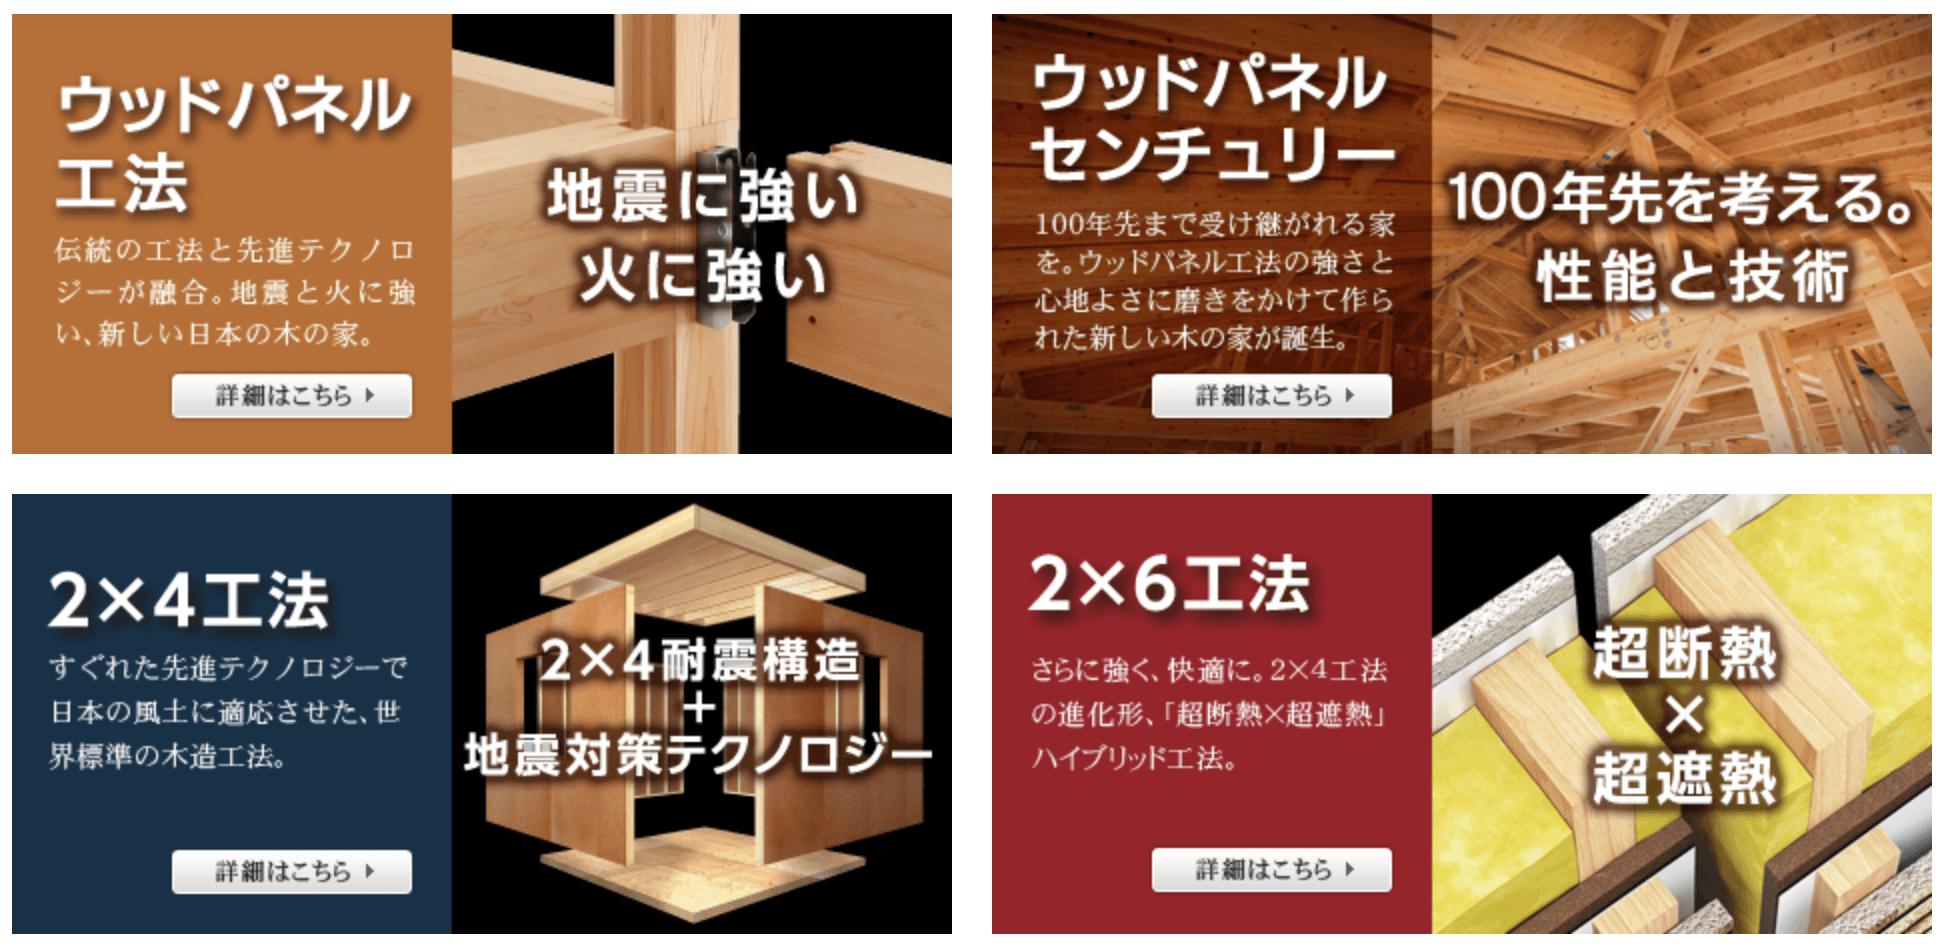 住友不動産の木質工法